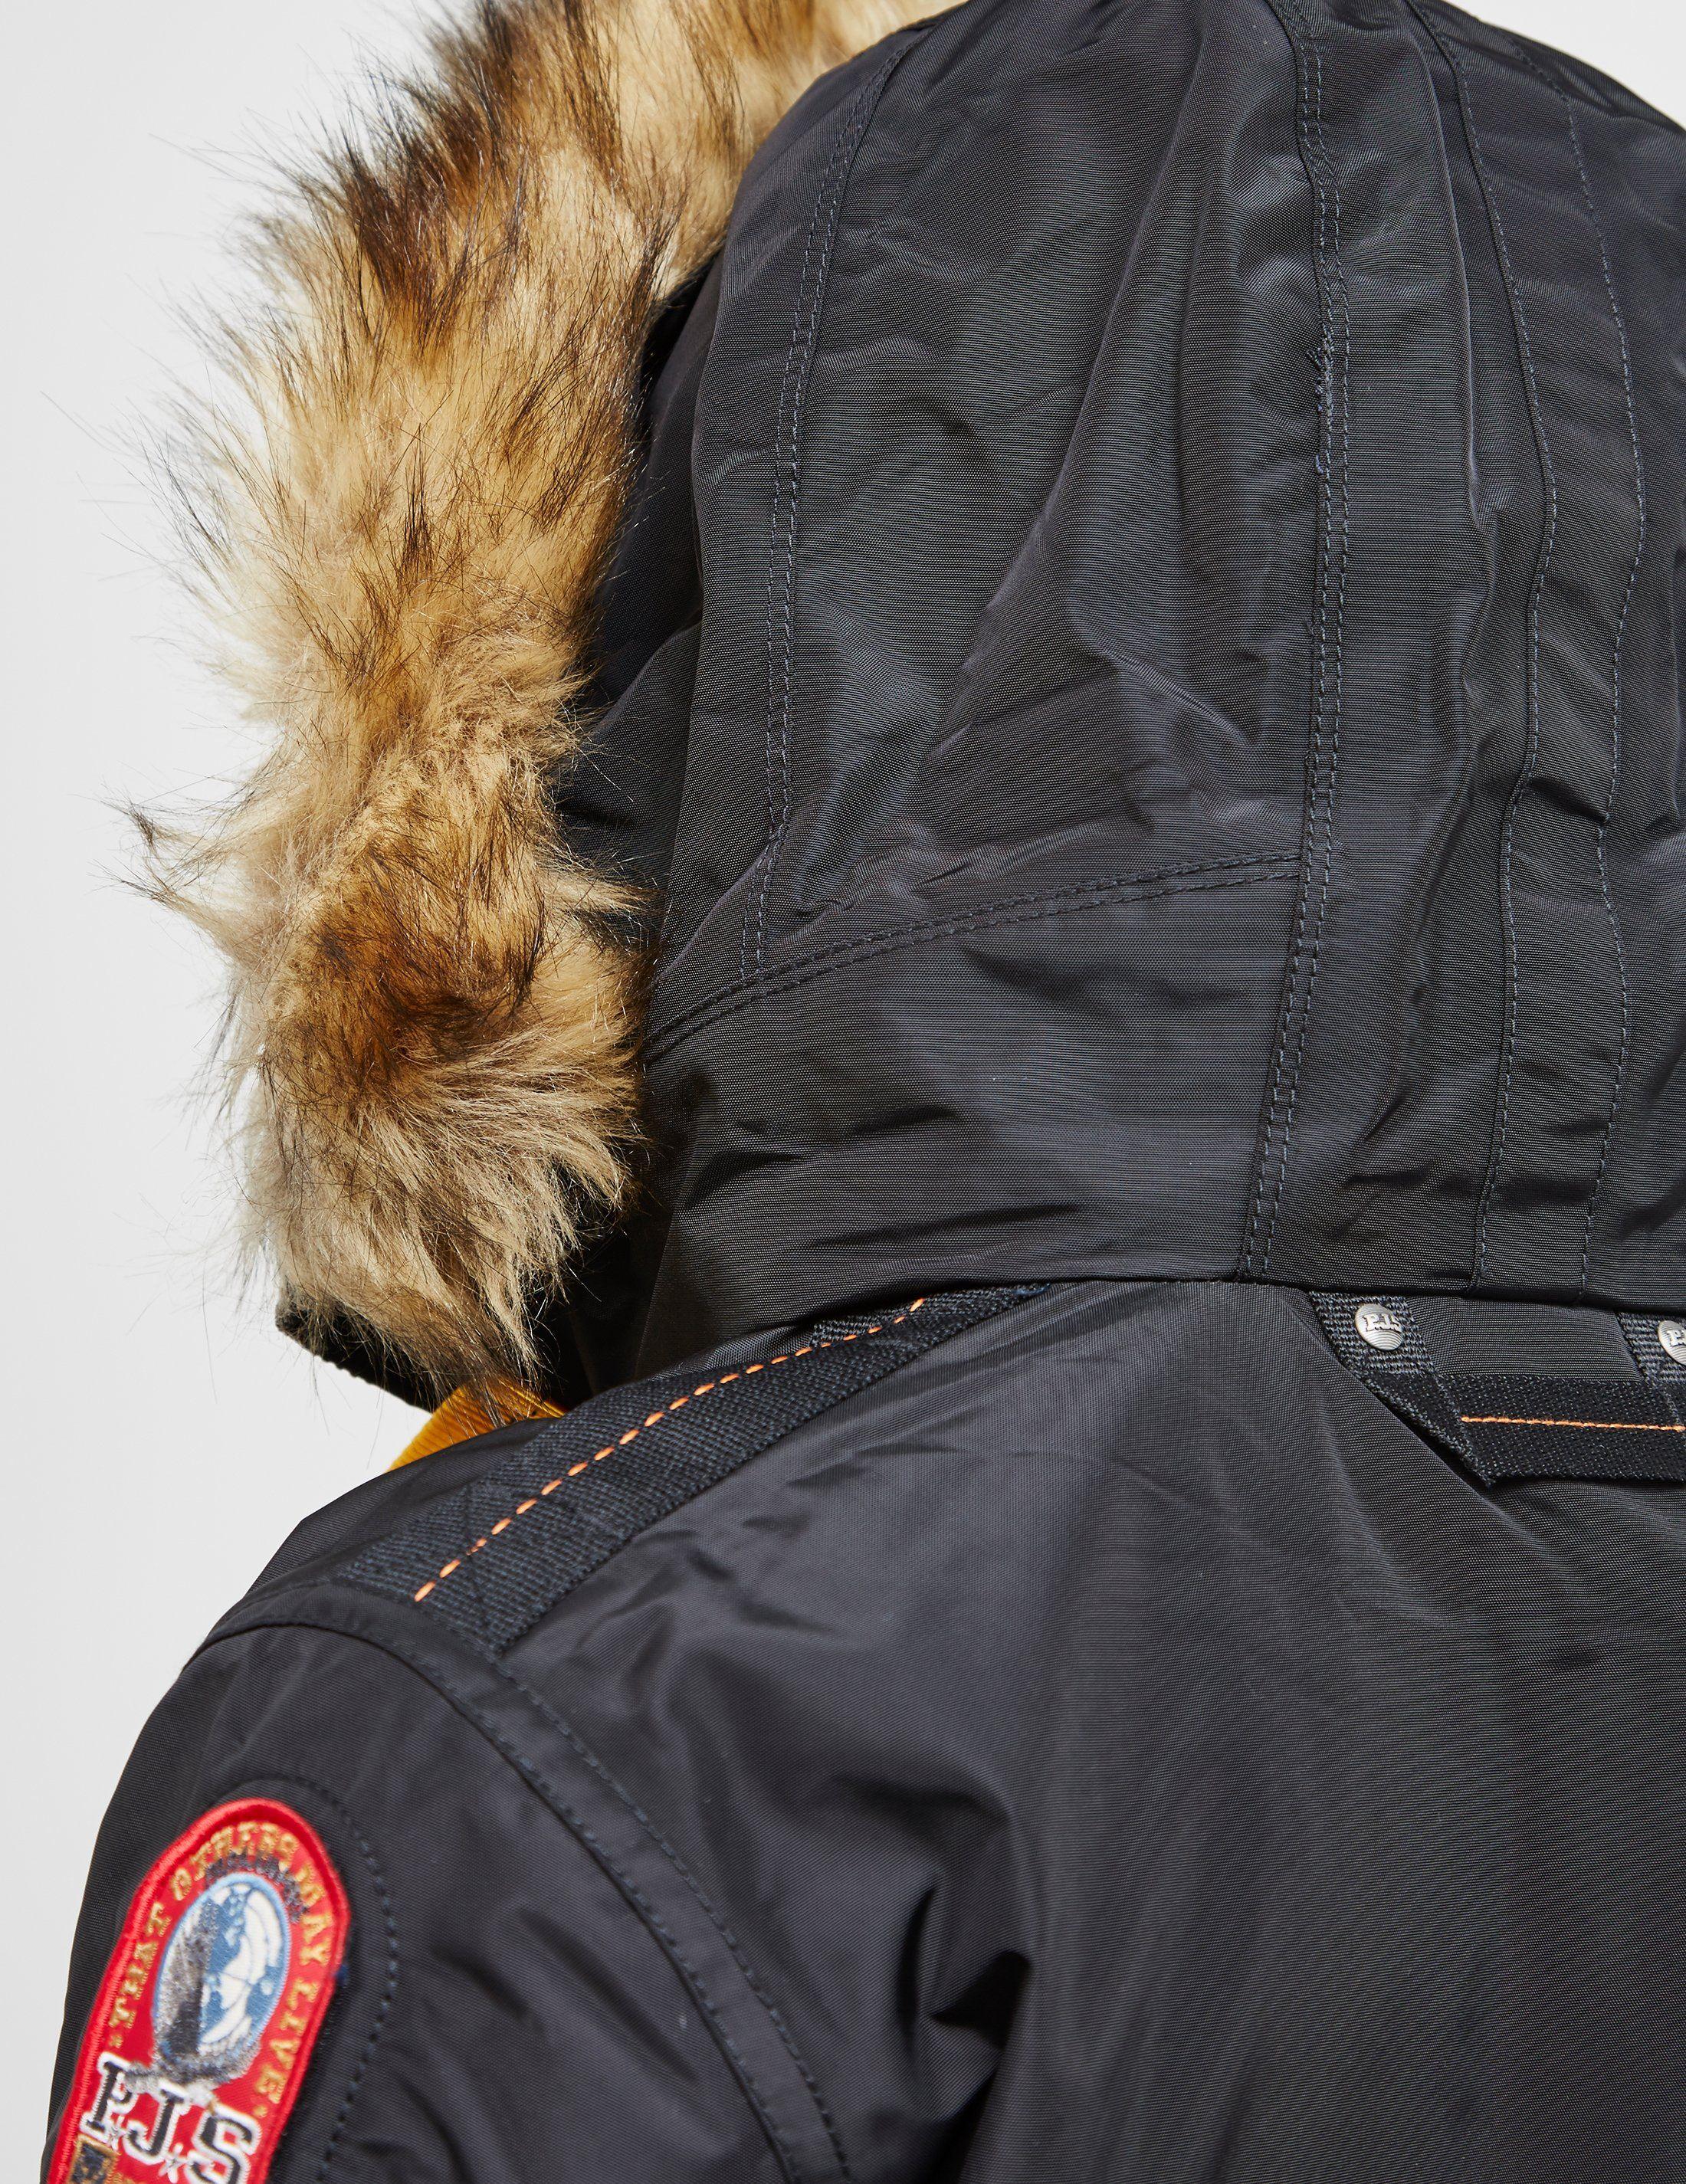 Parajumpers Gobi Eco Bomber Jacket - Online Exclusive